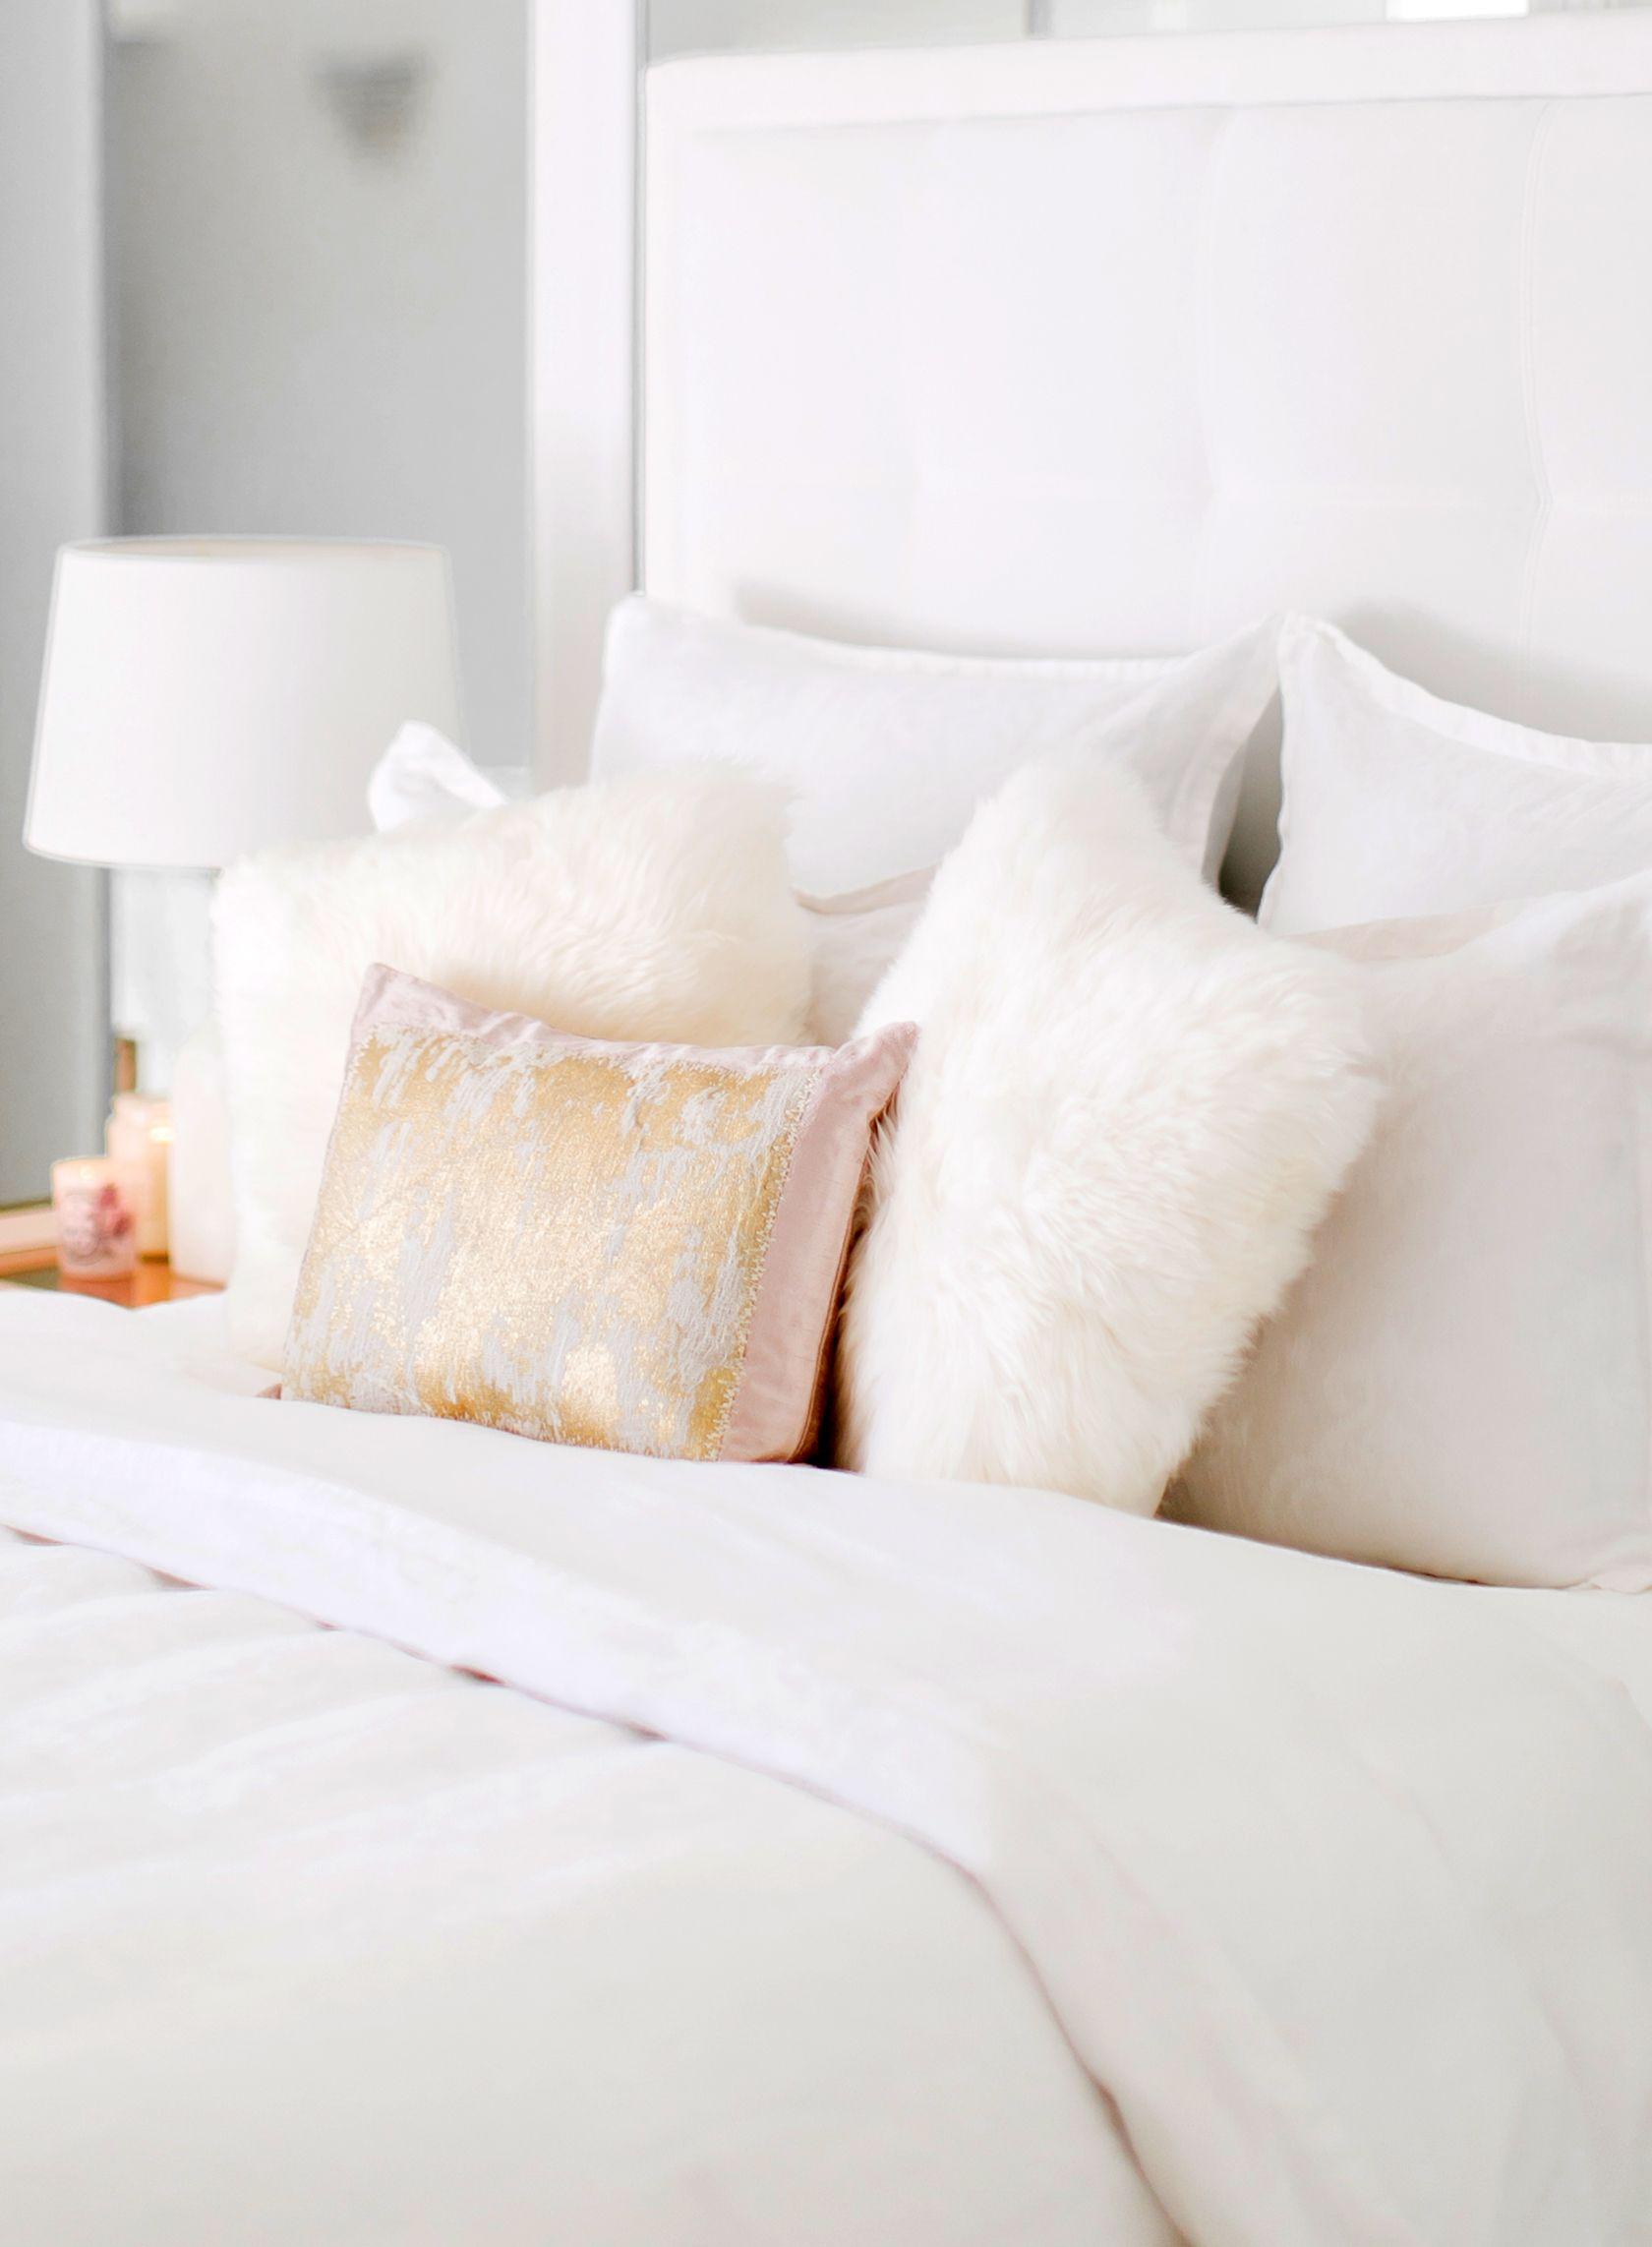 sydne style shares bedroom decorating